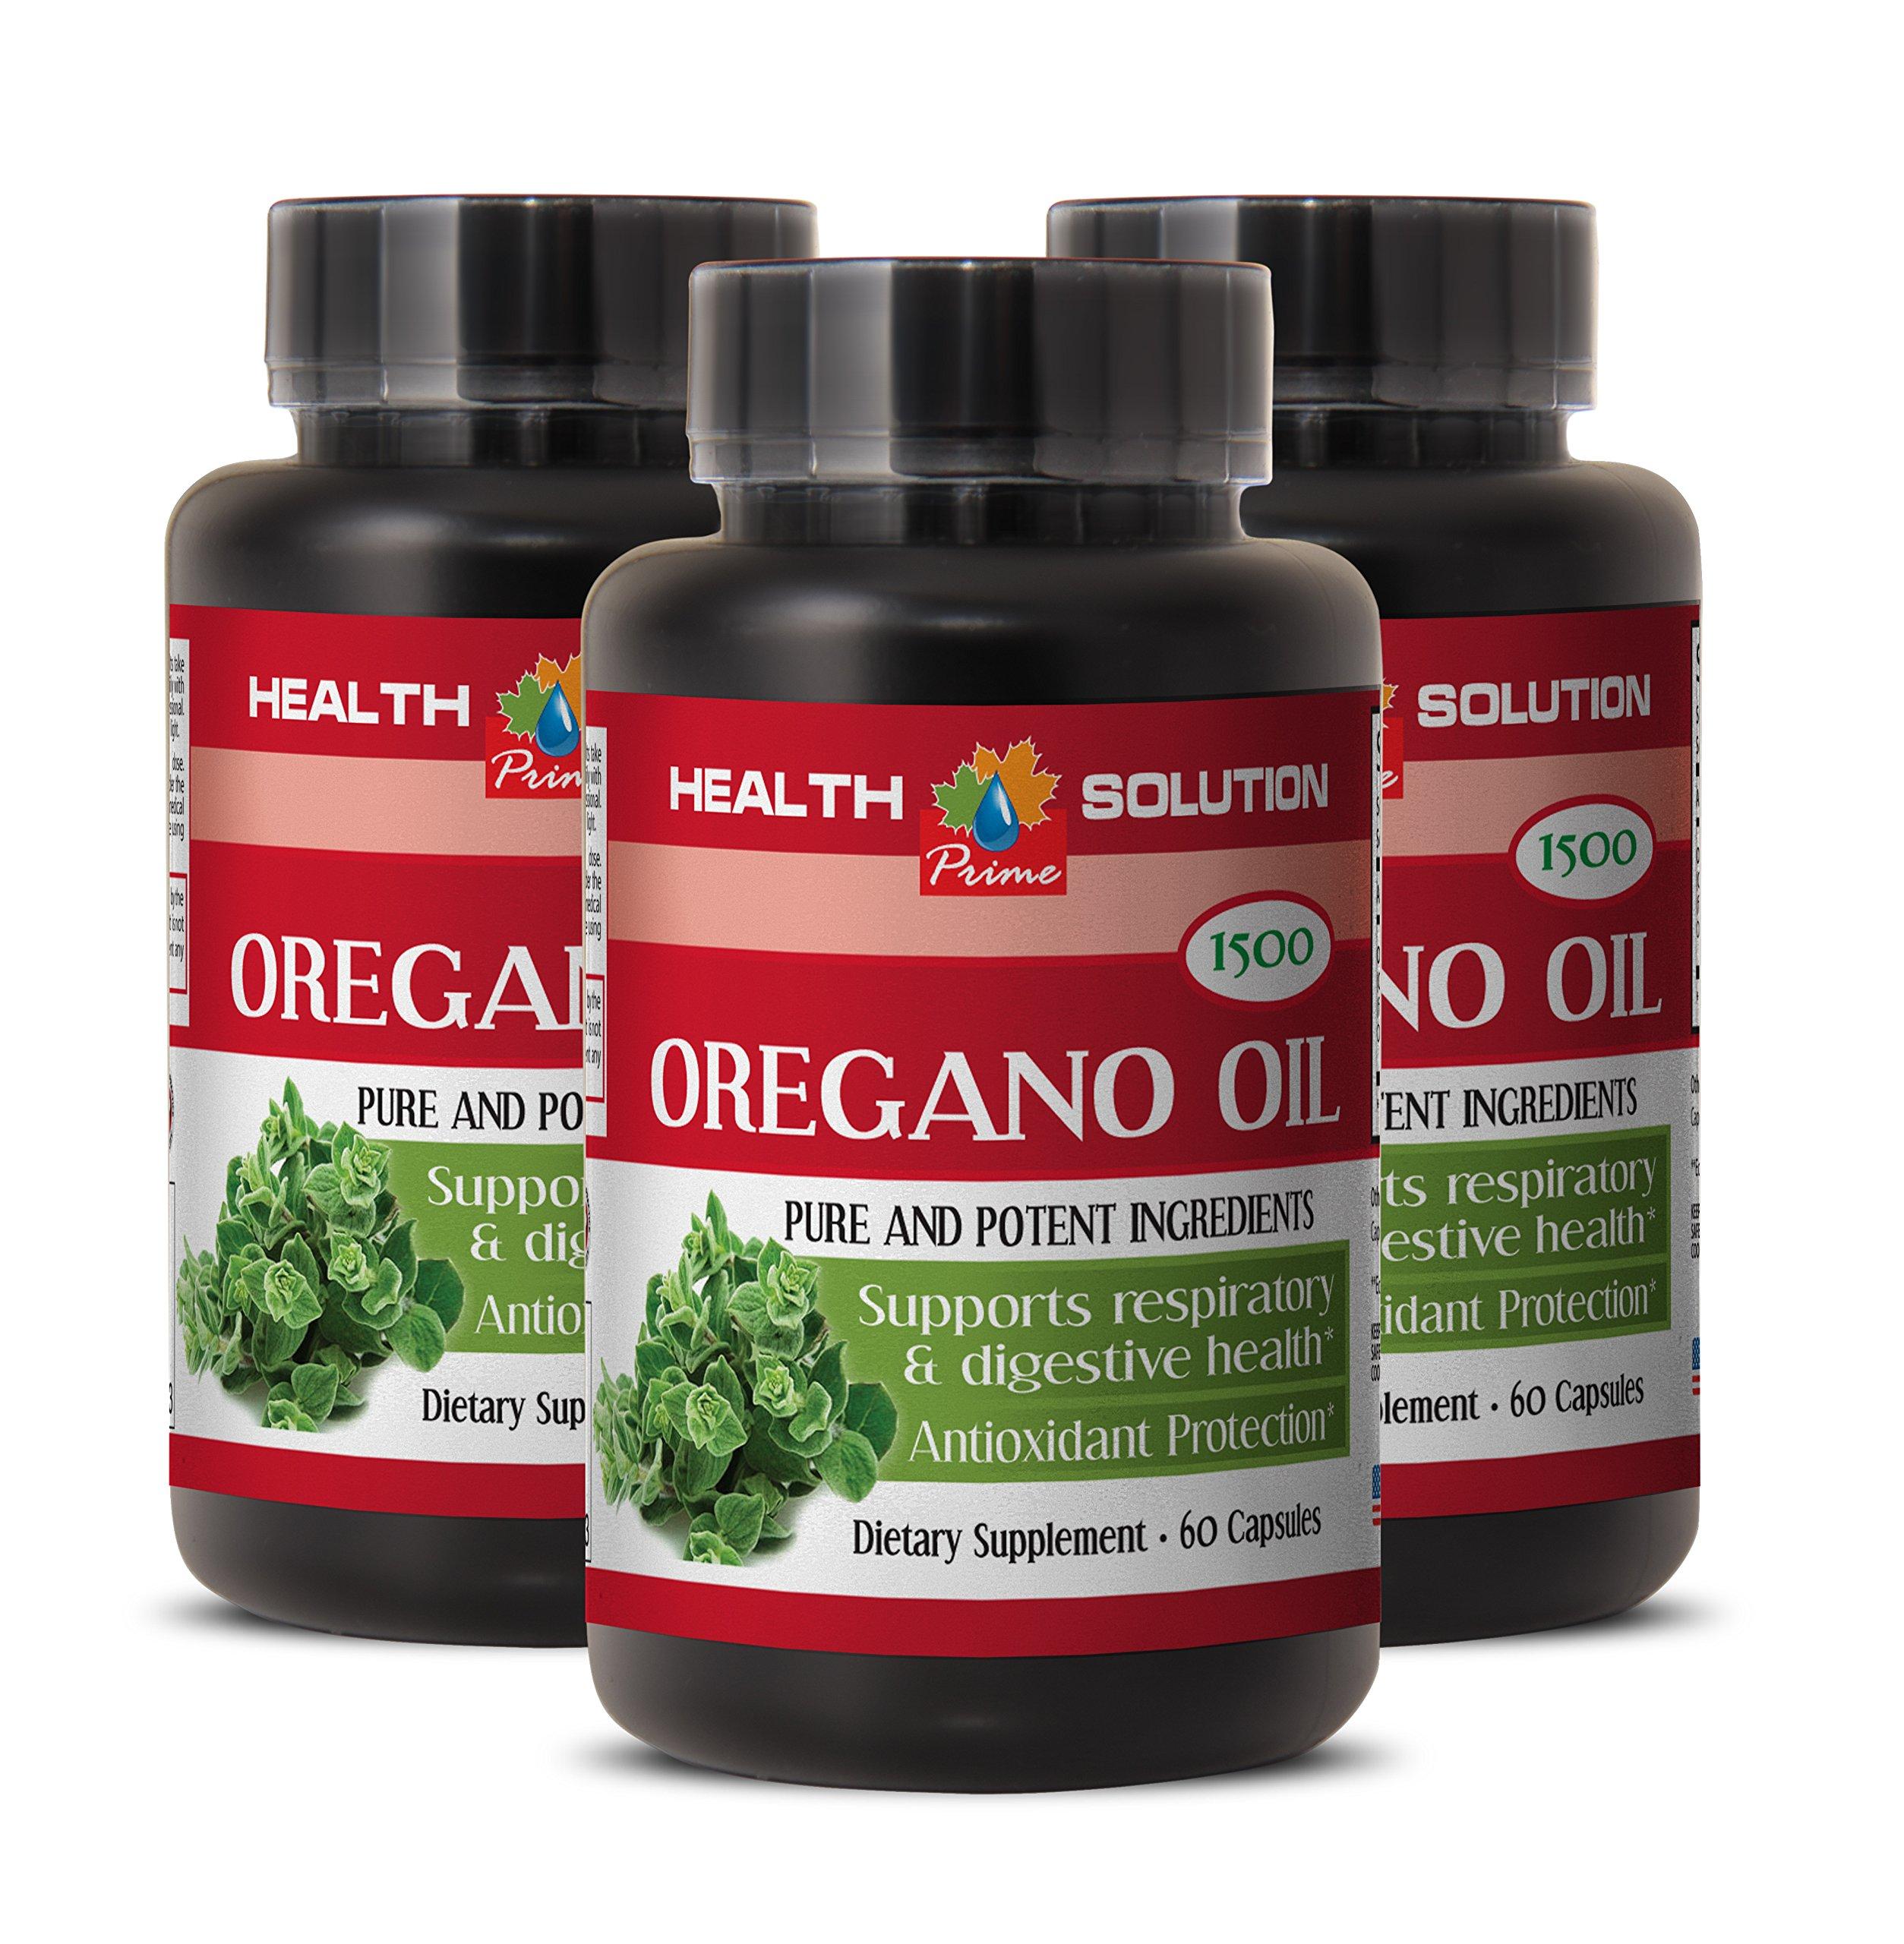 Immune Booster - Pure Oil of Oregano Extract 1500 Mg - Allergy Relief Oregano - 3 Bottles 180 Capsules